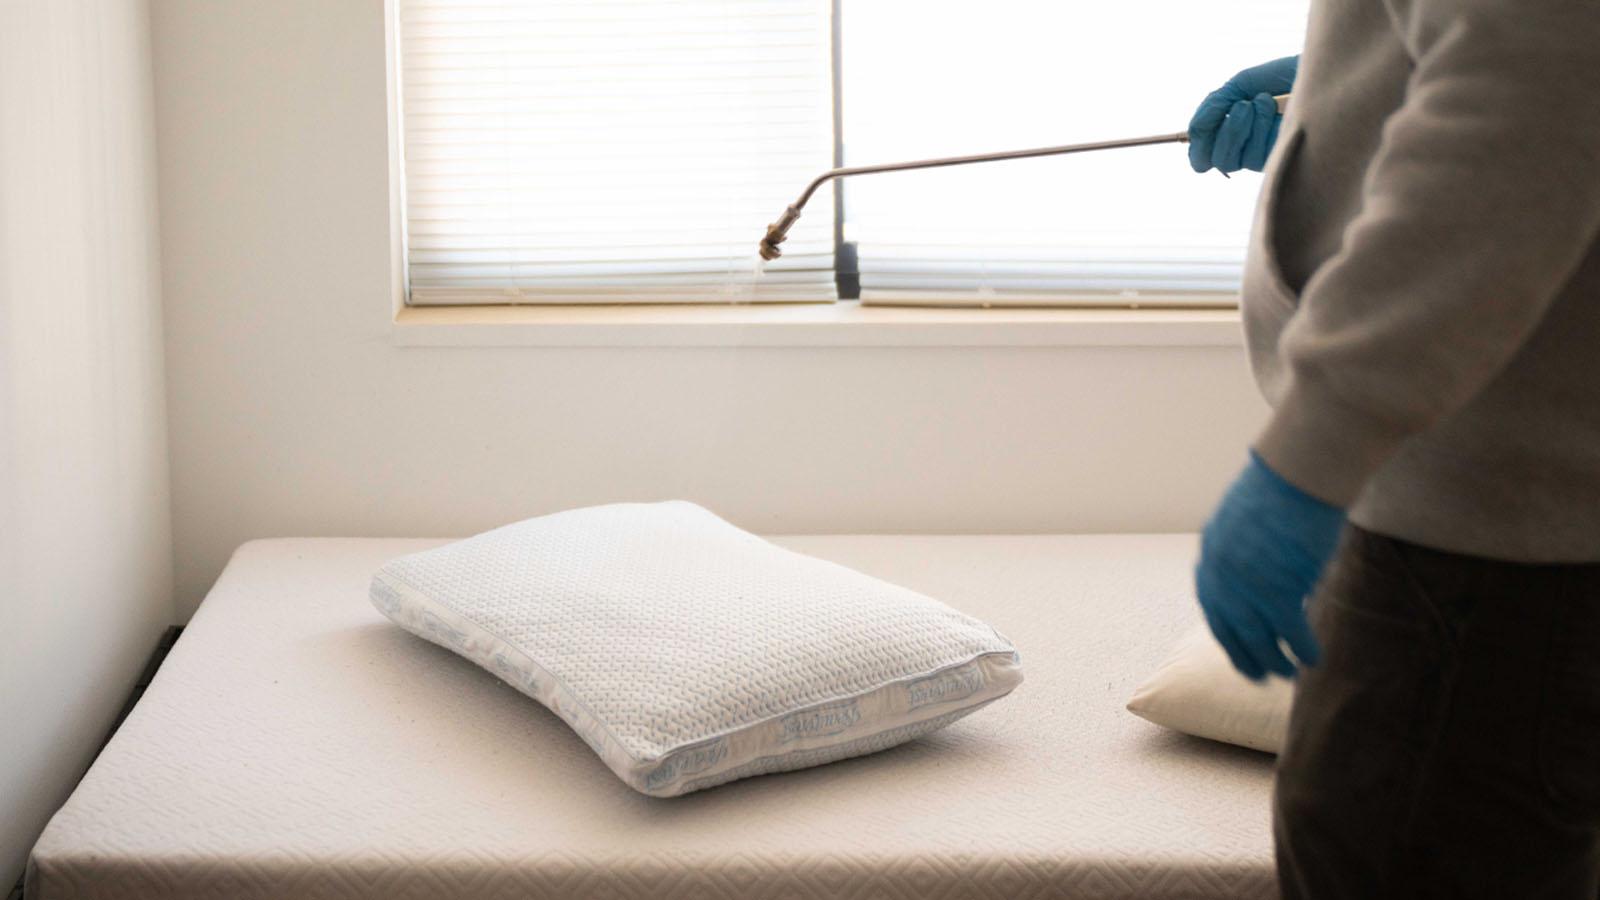 bed bug heat and spray treatments bournemouth swindown taunton worthing bristol southampton dorset hampshire